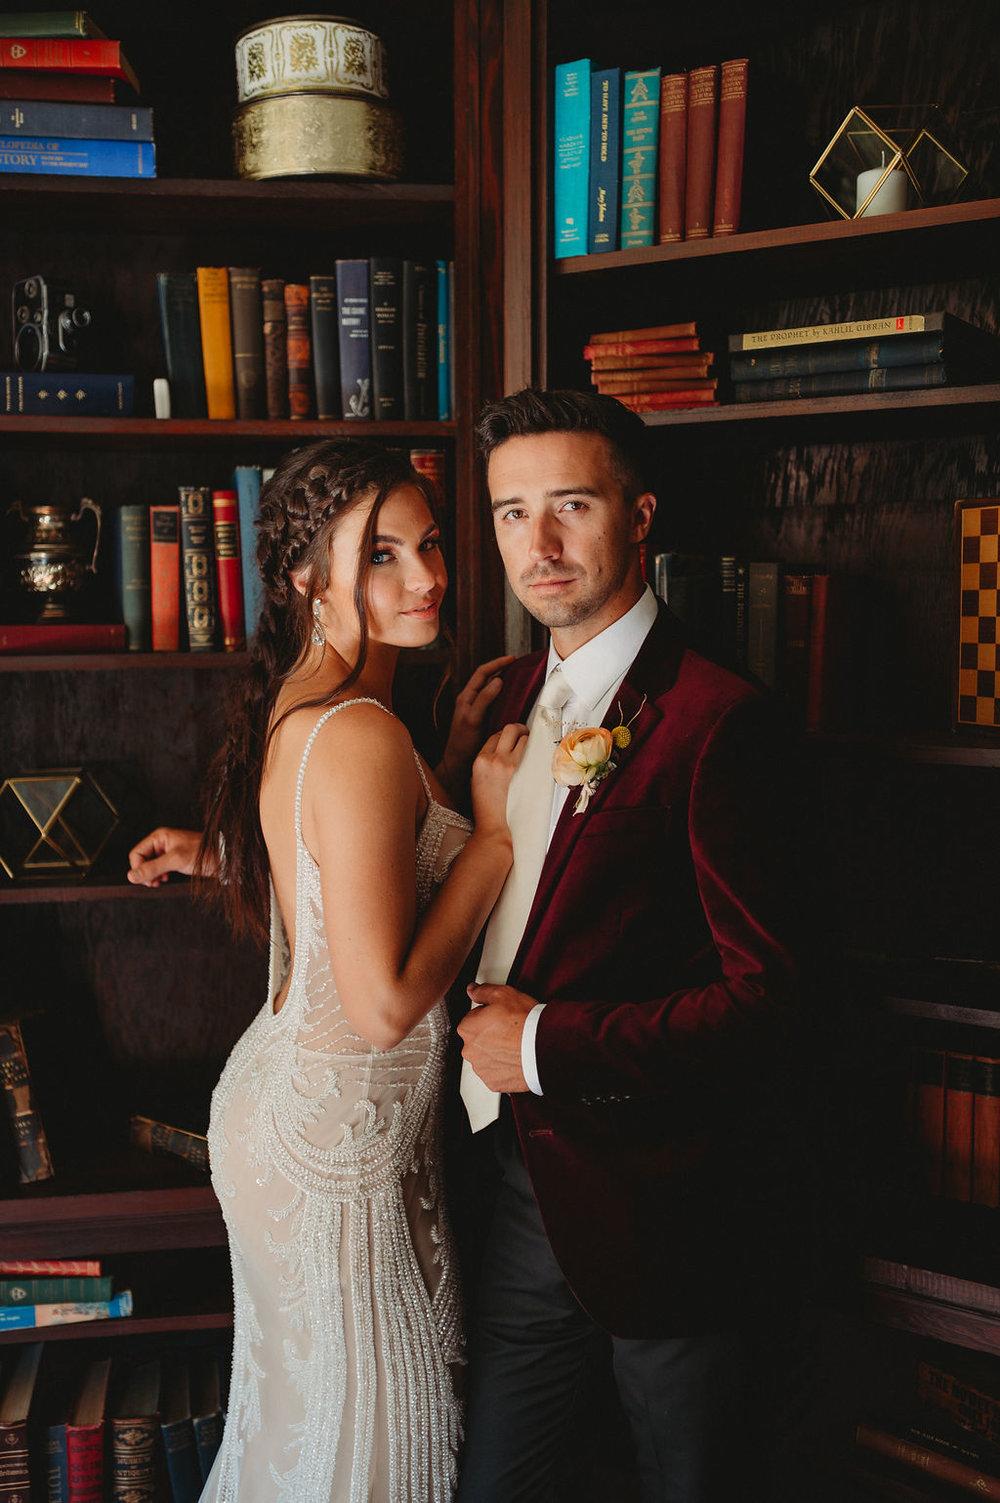 Dewitt-for-Love-Photography-Howey-Mansion-Photos-Wedding-Photographer-203.jpg